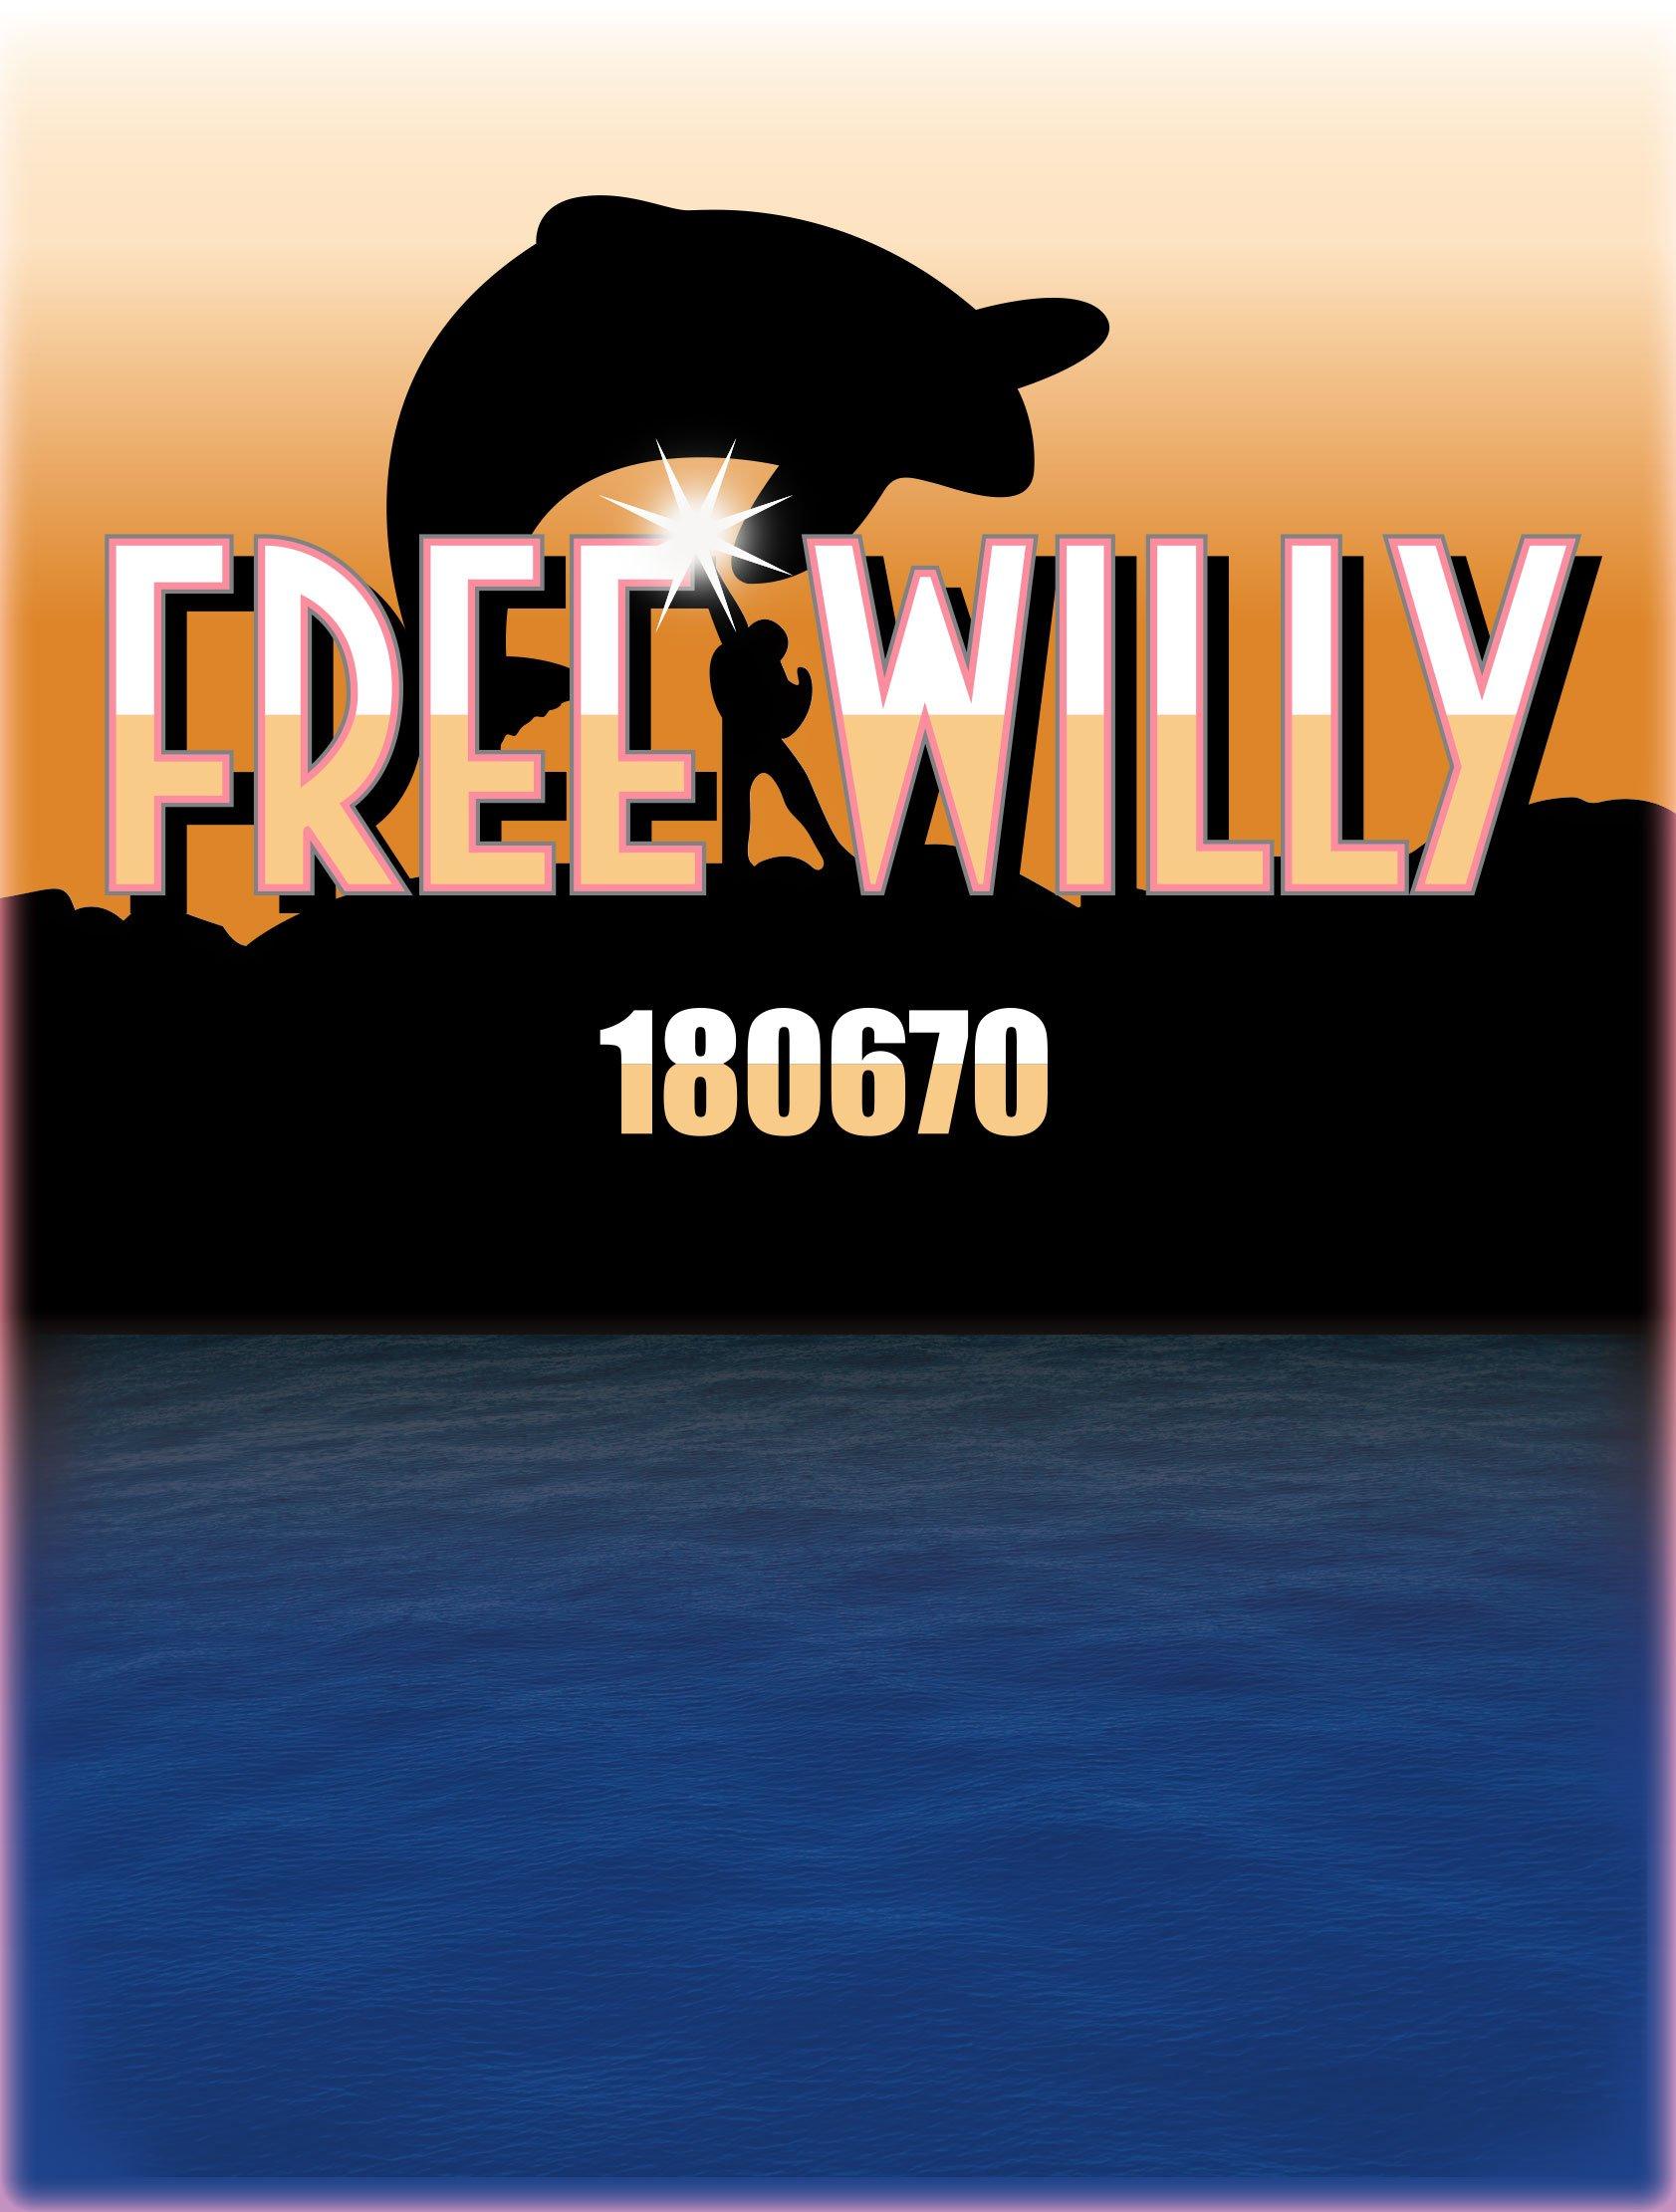 Free Willy Logo2 1